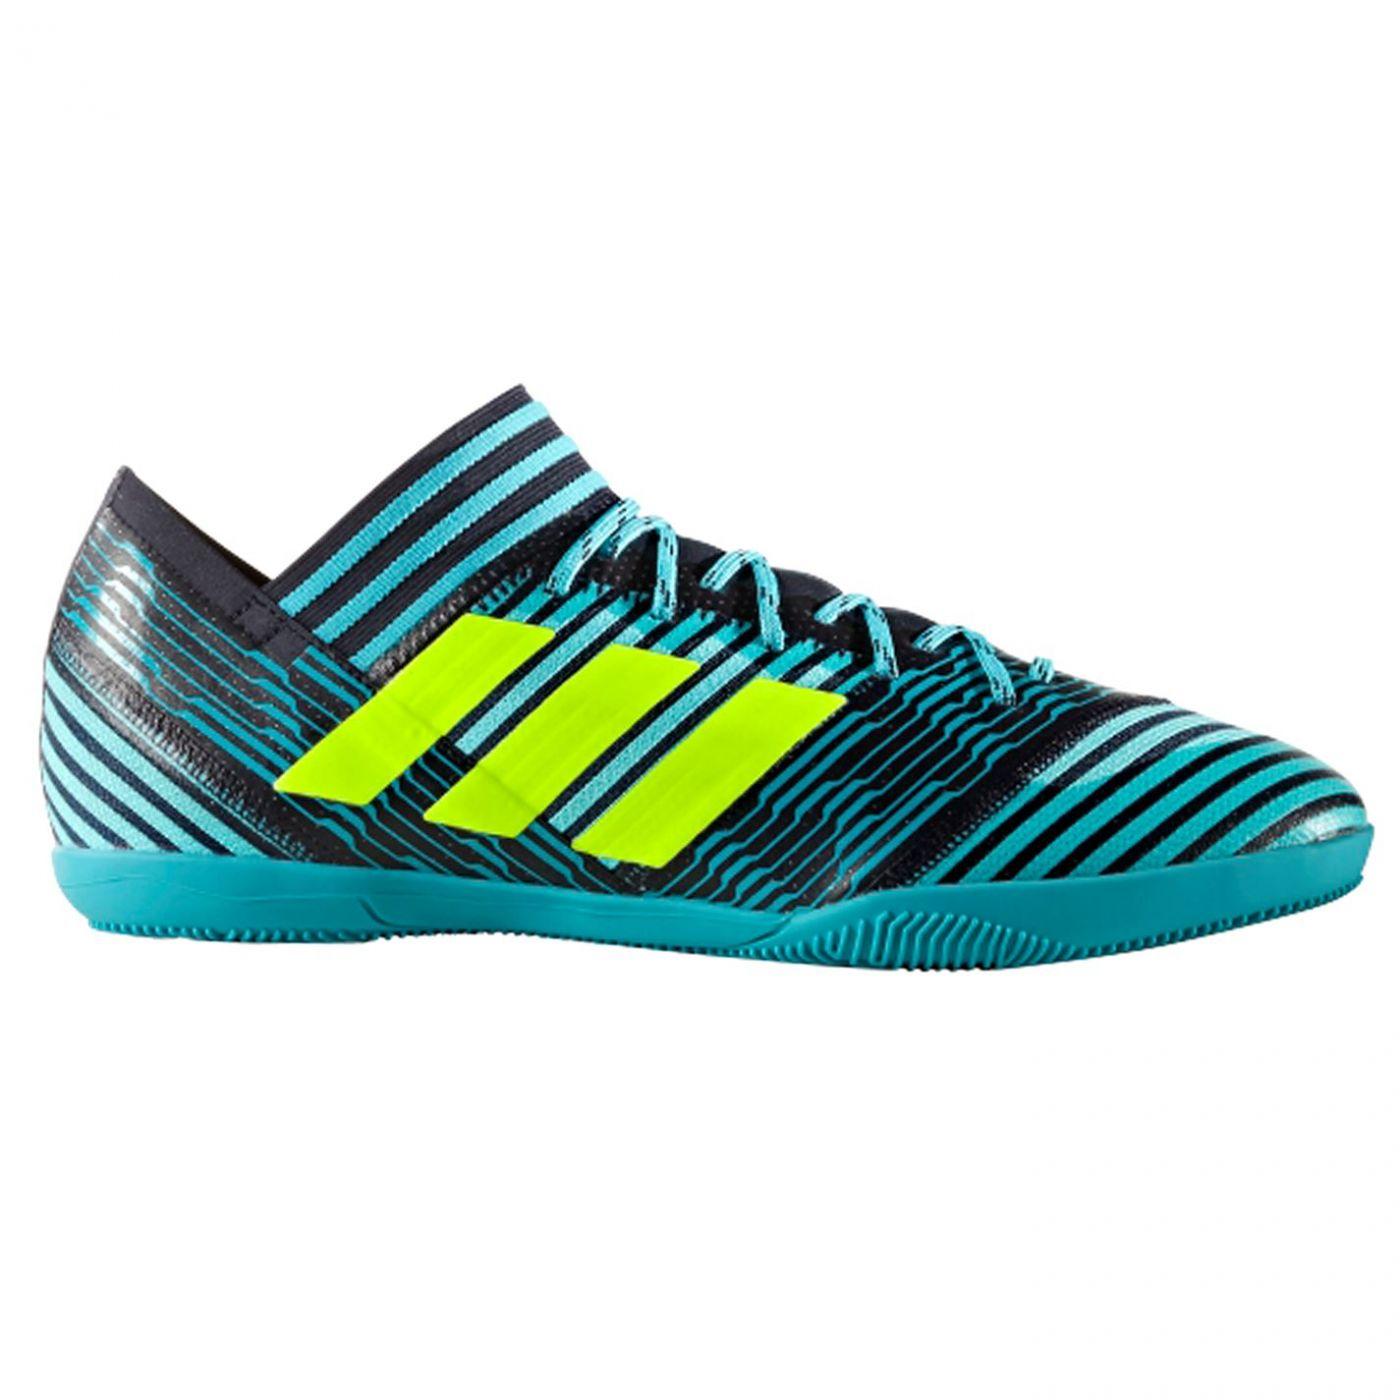 Adidas Nemeziz 17.3 Mens Indoor Football Trainers